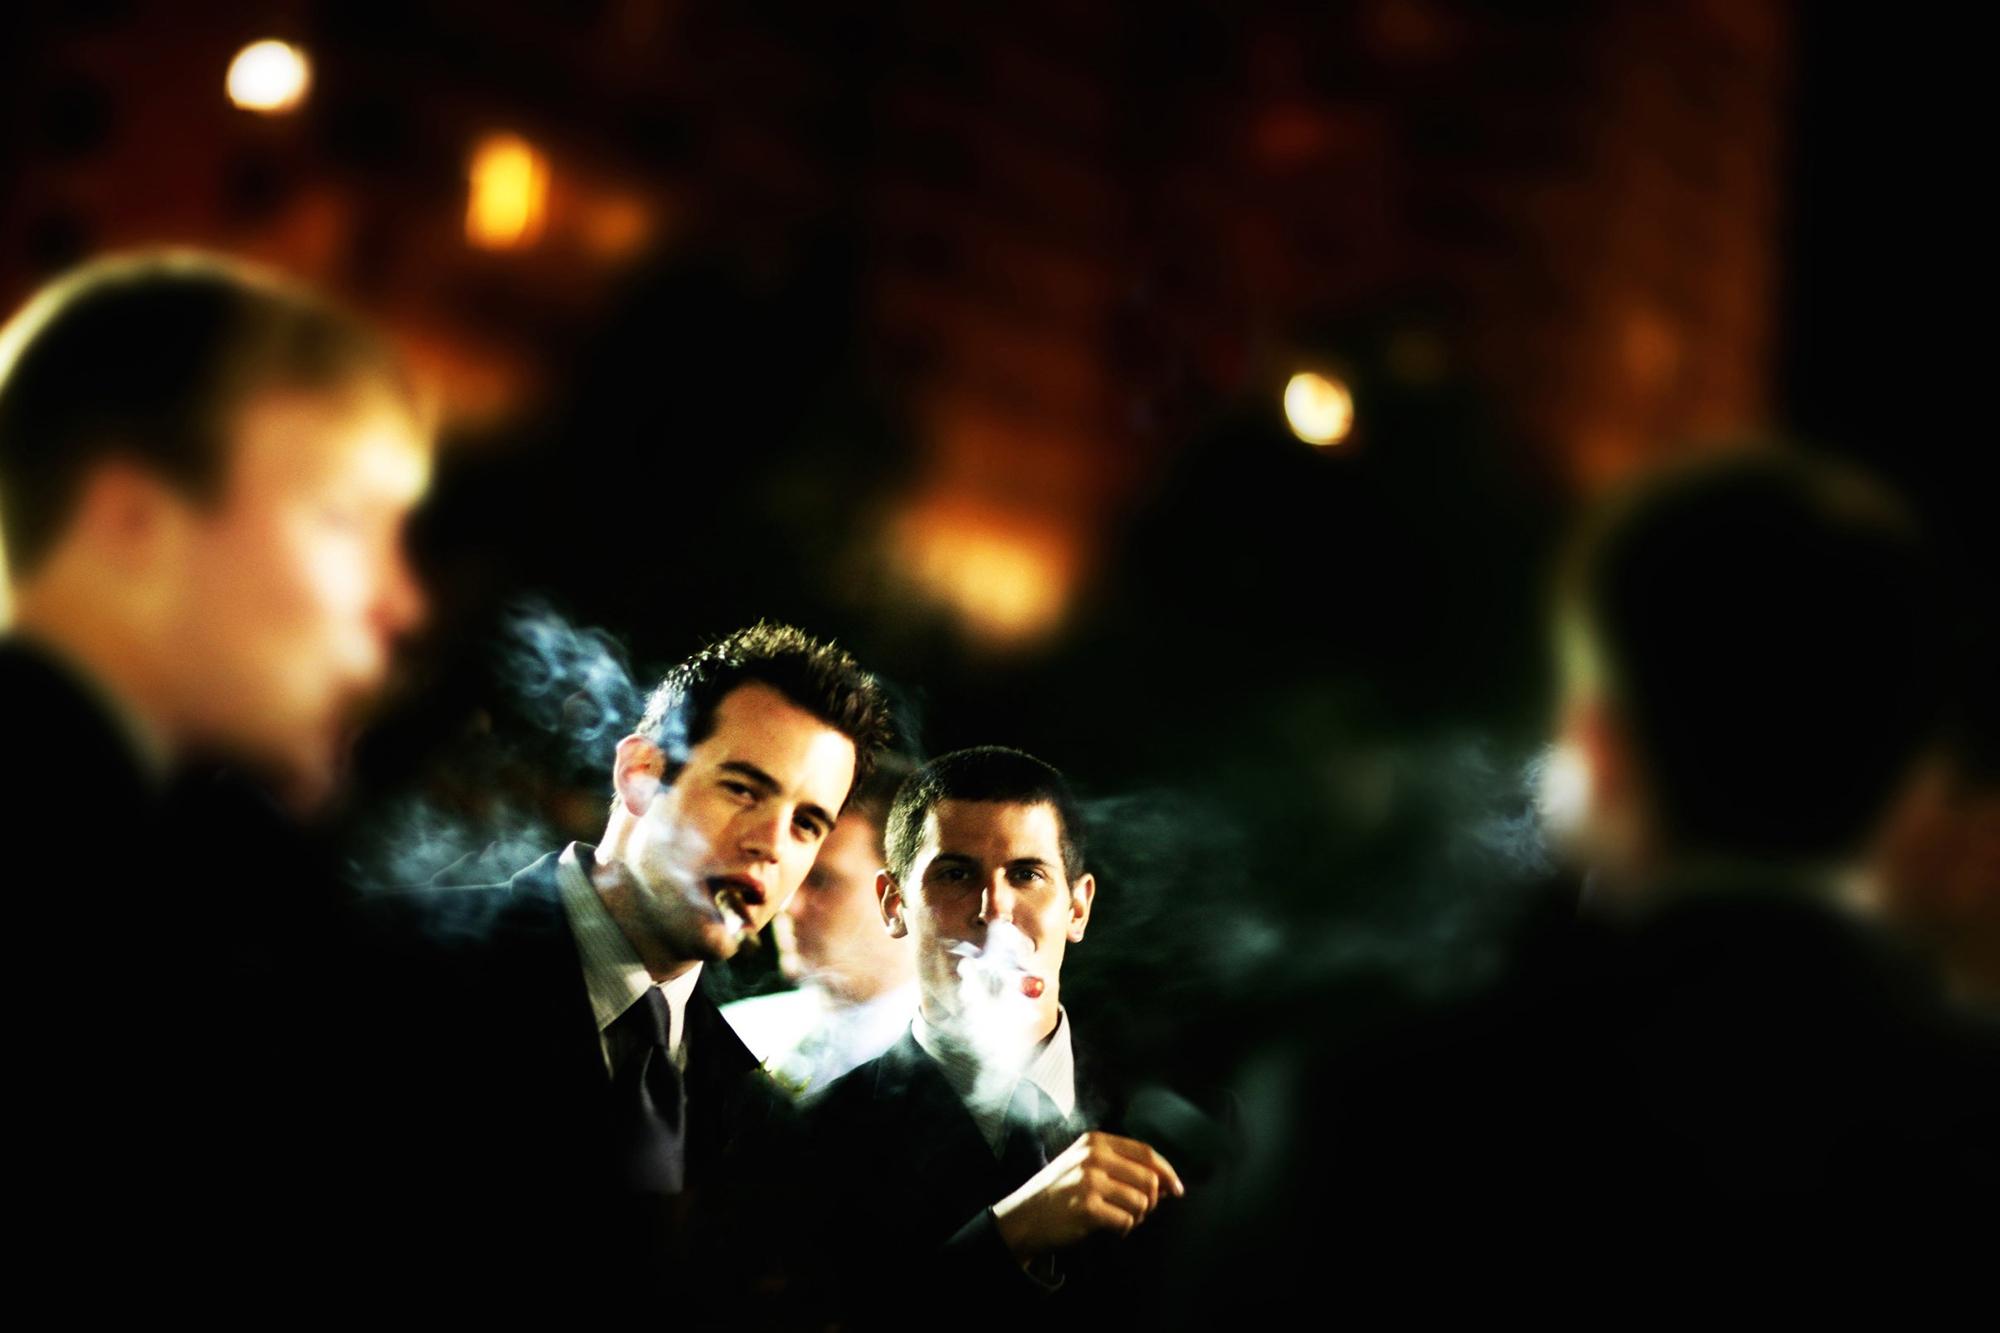 two-young-men-smoke-cigars-mca-chicago-gala.jpg